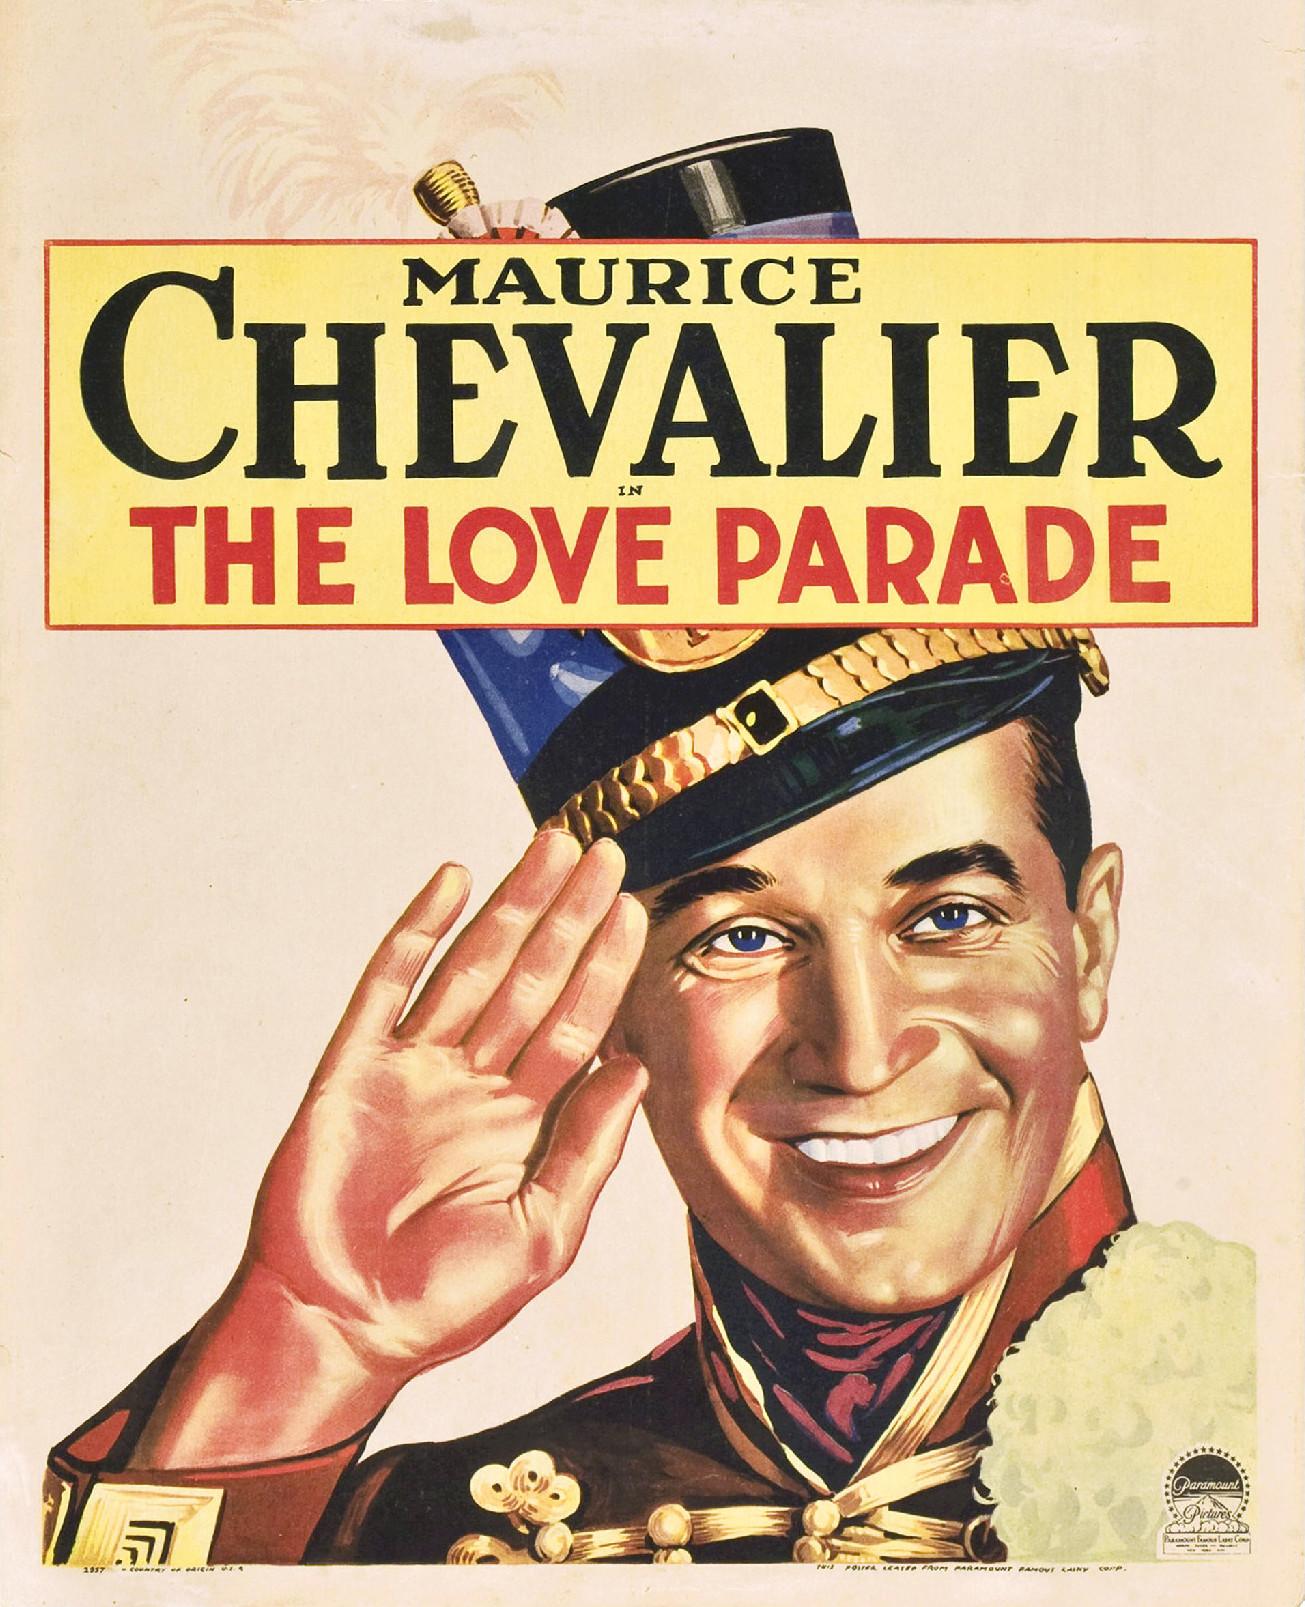 The Love Parade - Wikipedia